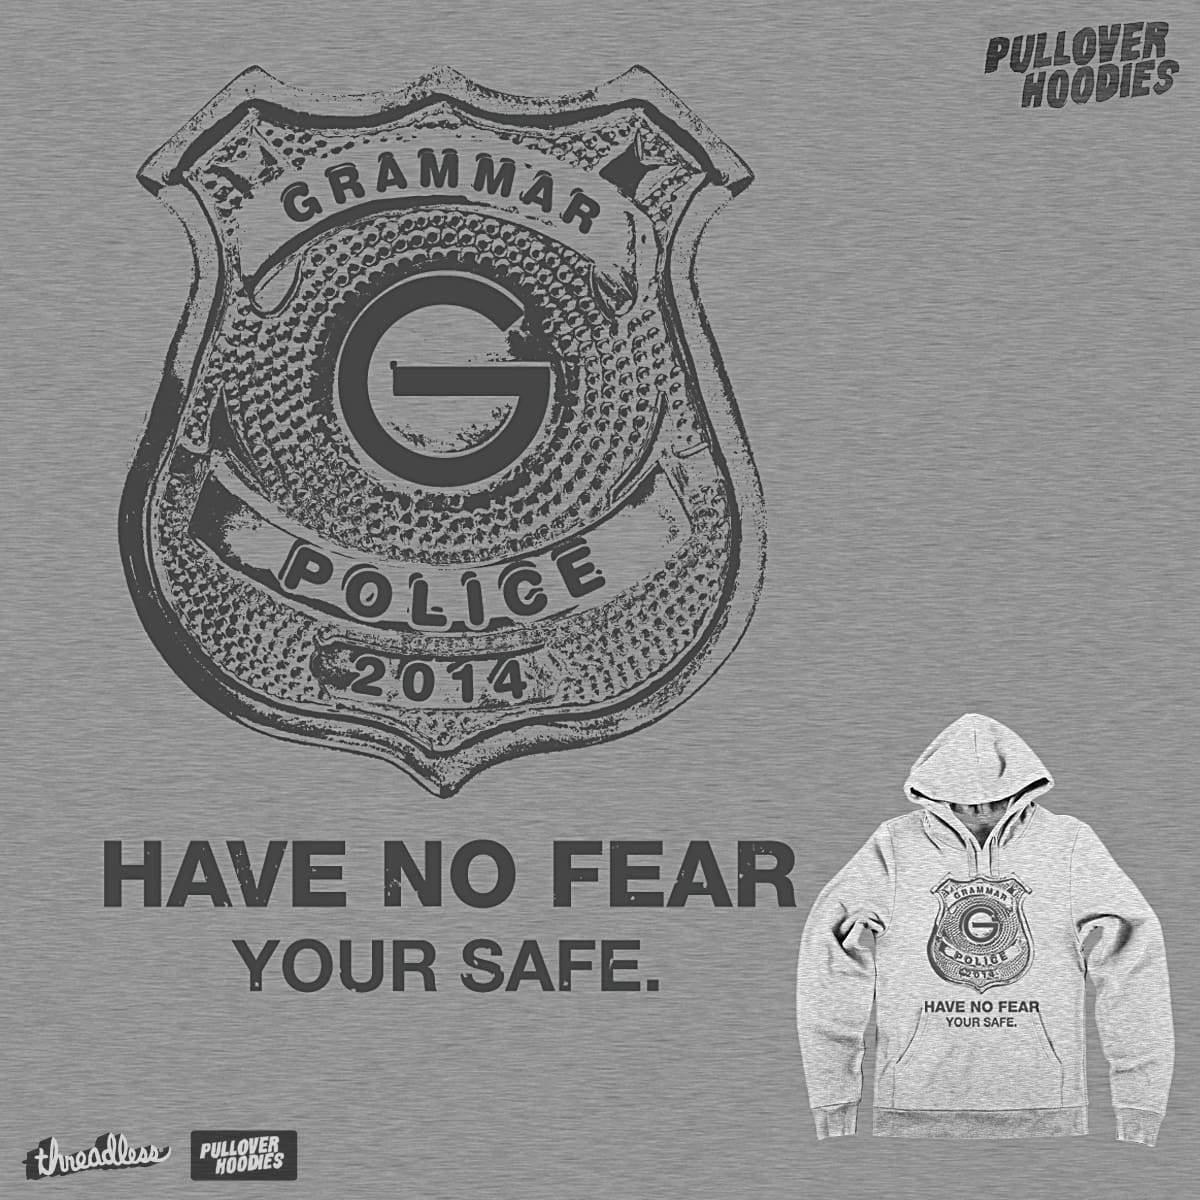 GRAMMER POLICE by rhobdesigns on Threadless